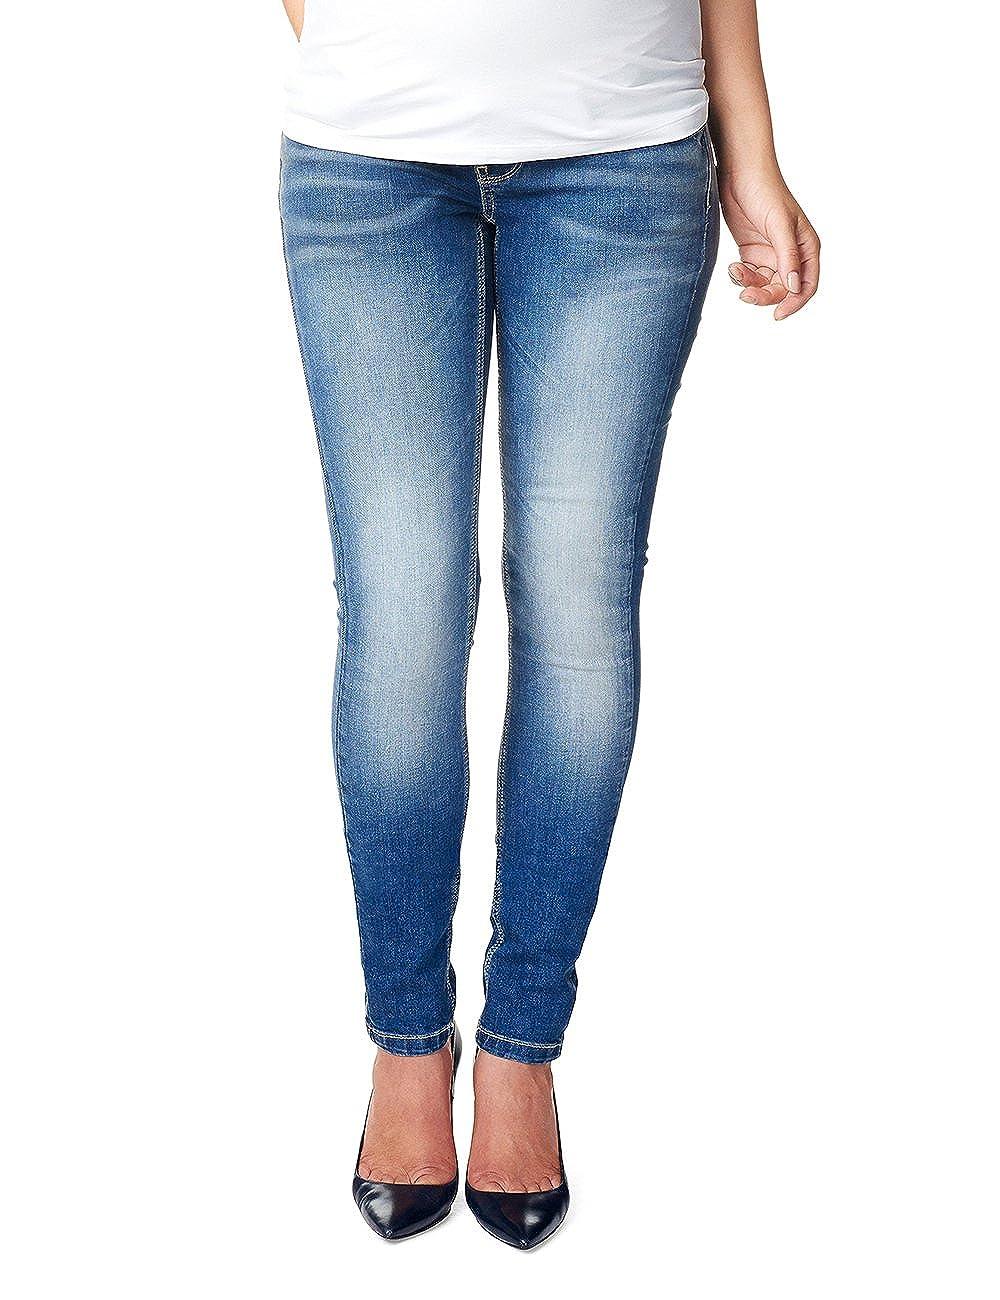 Noppies Women's Jeans OTB Skinny Tara Maternity Jeans 60037